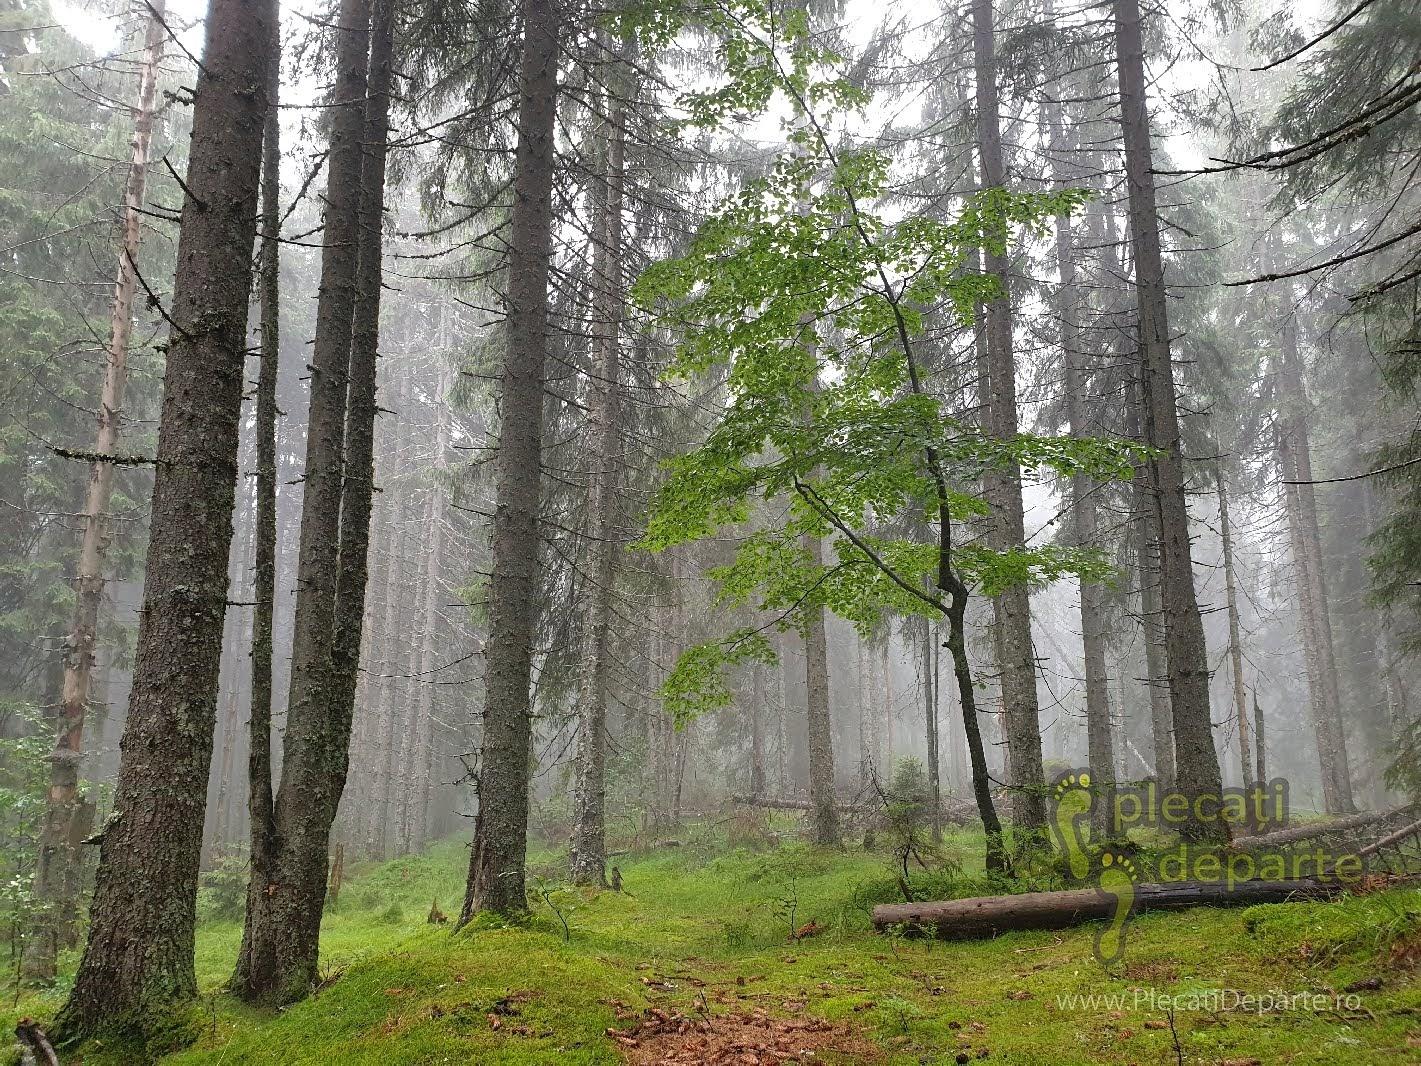 Padure seculara de brad in Parcul Natural Apuseni, trasee padis apuseni, parcul natural apuseni obiective turitice, zona protejata